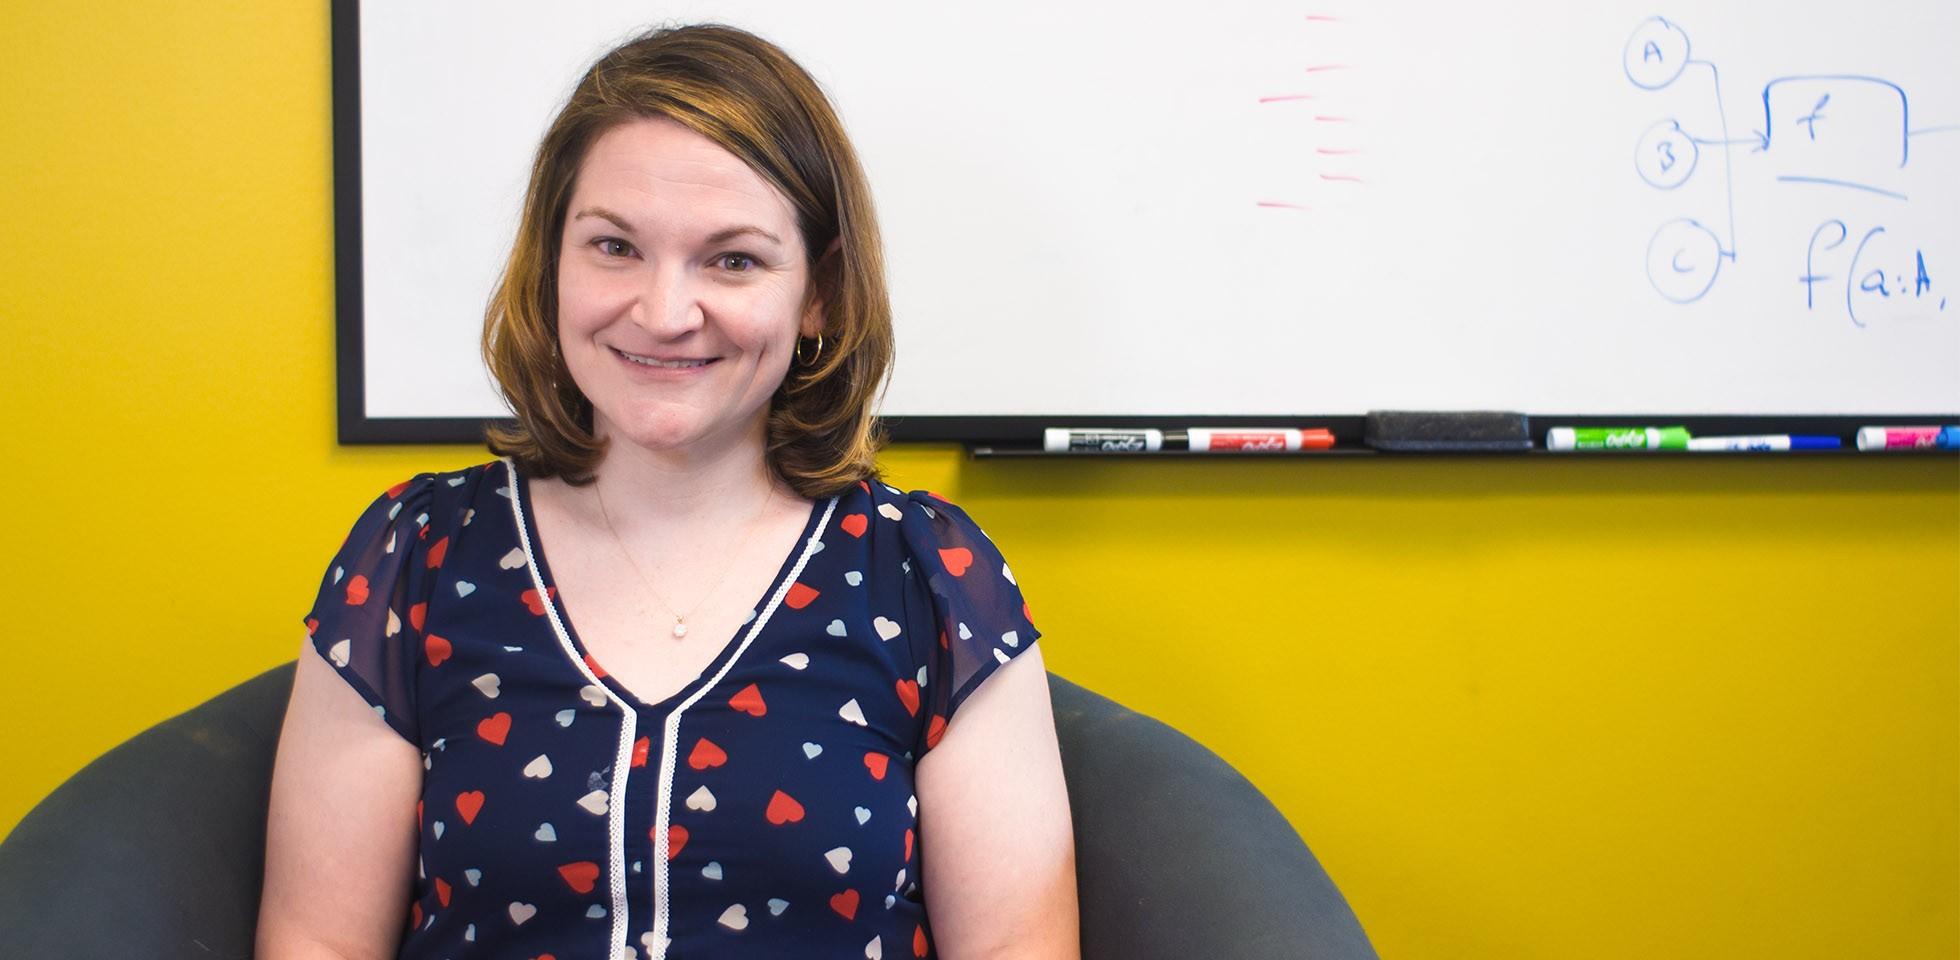 Julia Rezsnyak, Senior User Experience Designer - MAANA Careers